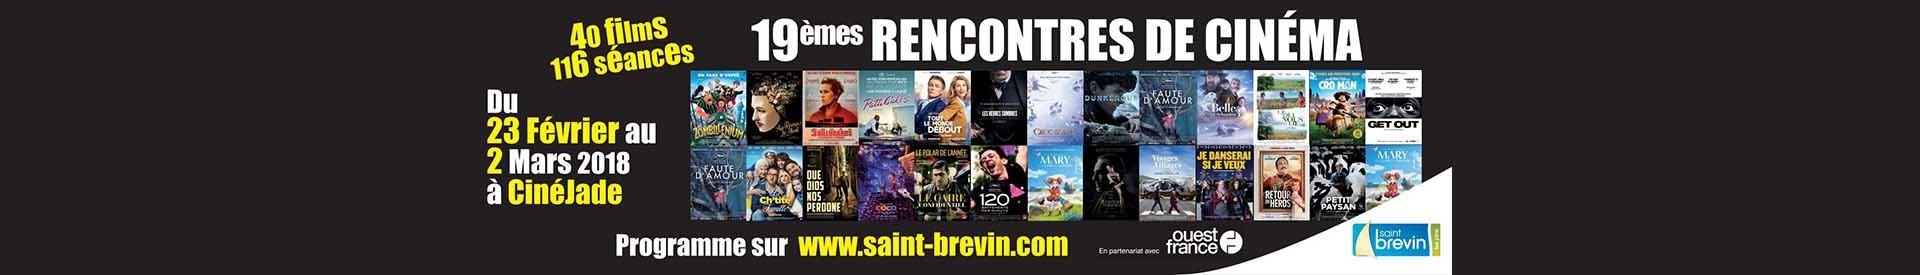 rencontres-cinema-st-brevin2018-1473